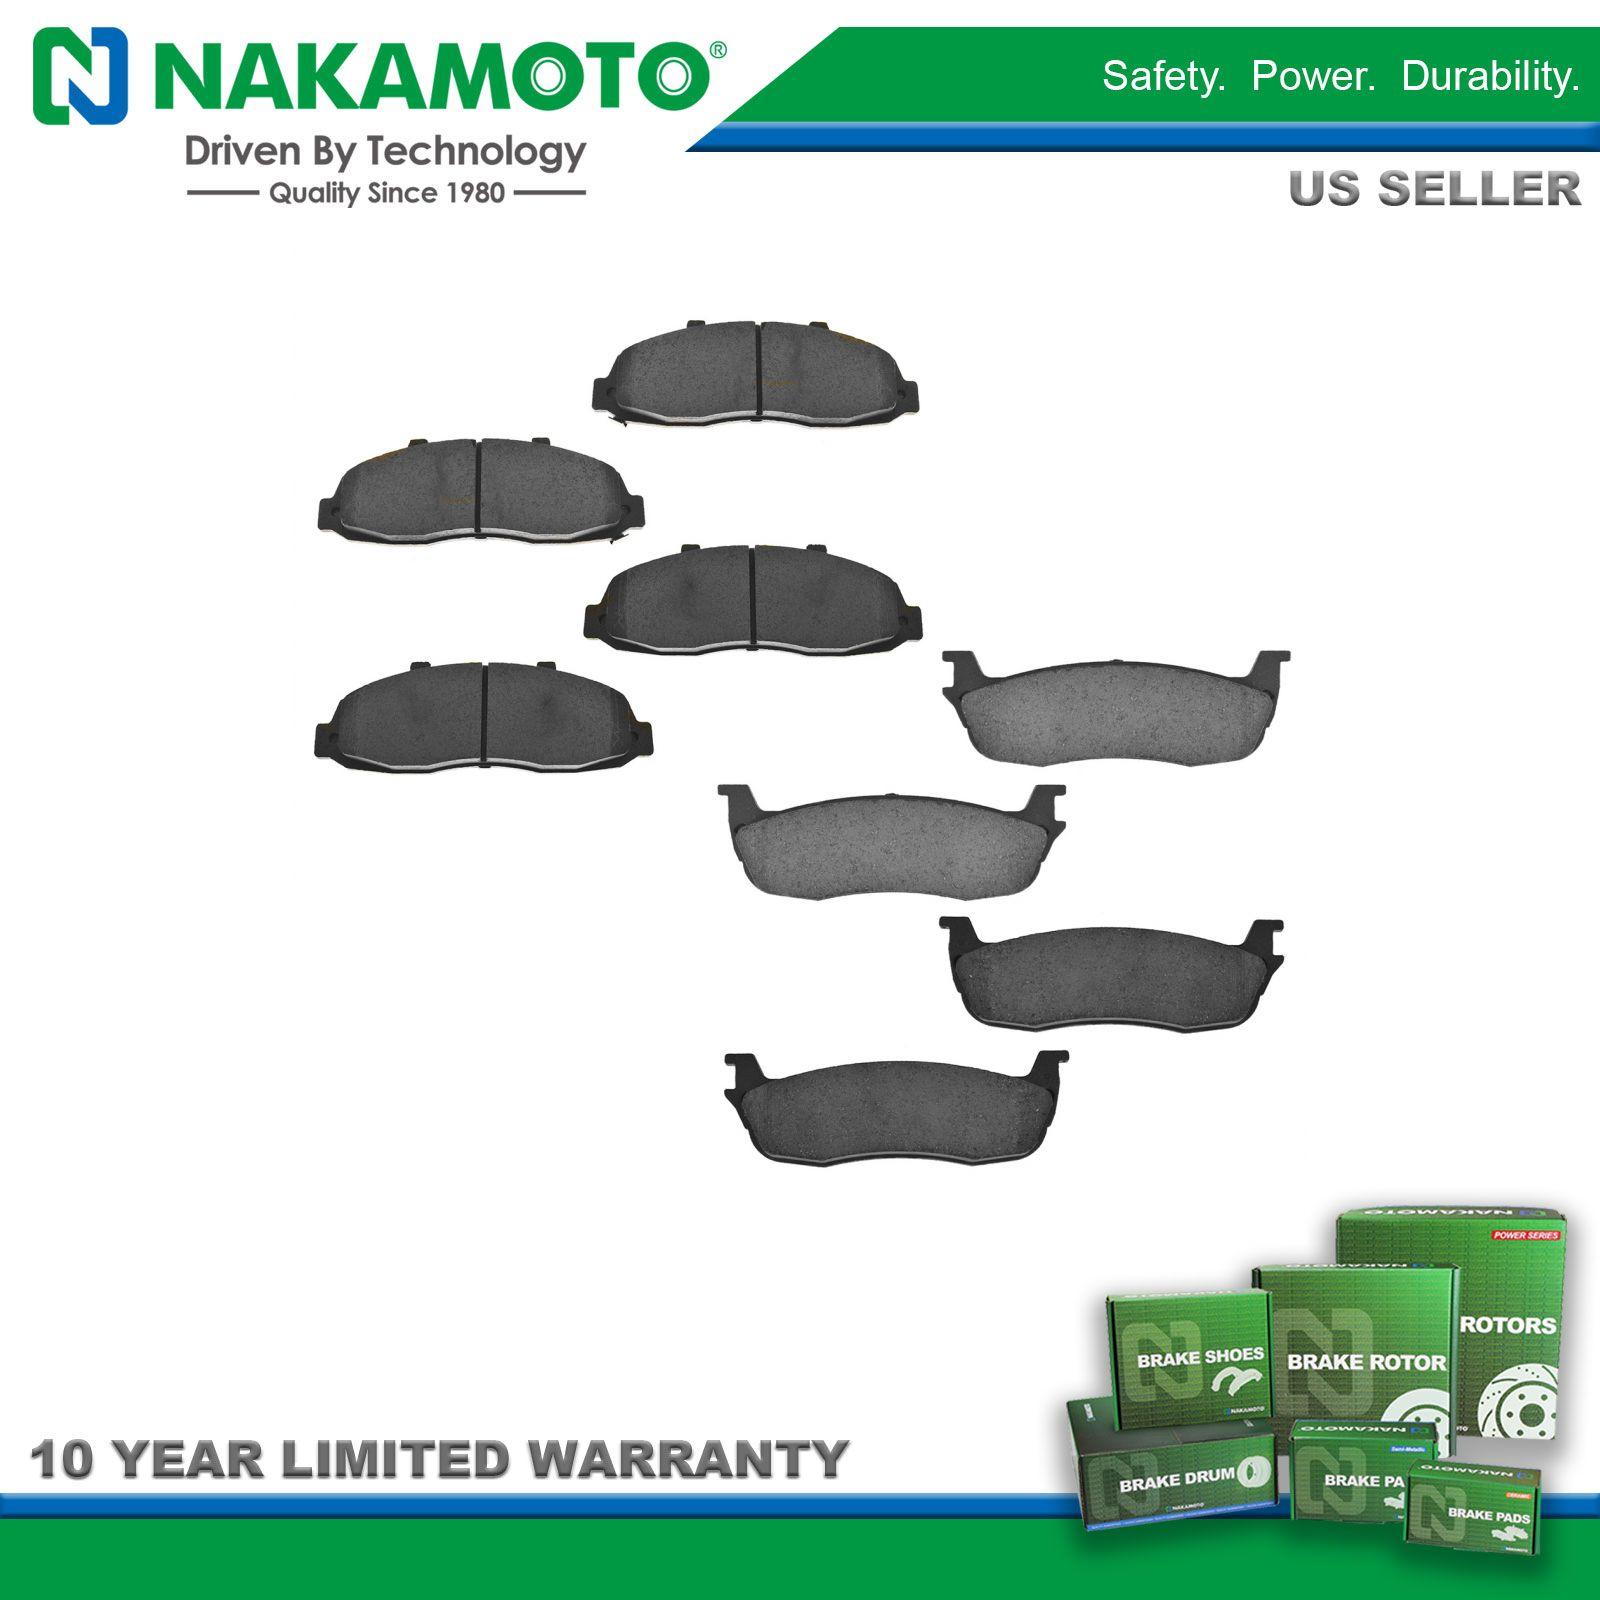 Nakamoto Front Disc Brake Pads Posi Ceramic Set for Ford Lincoln Jaguar New